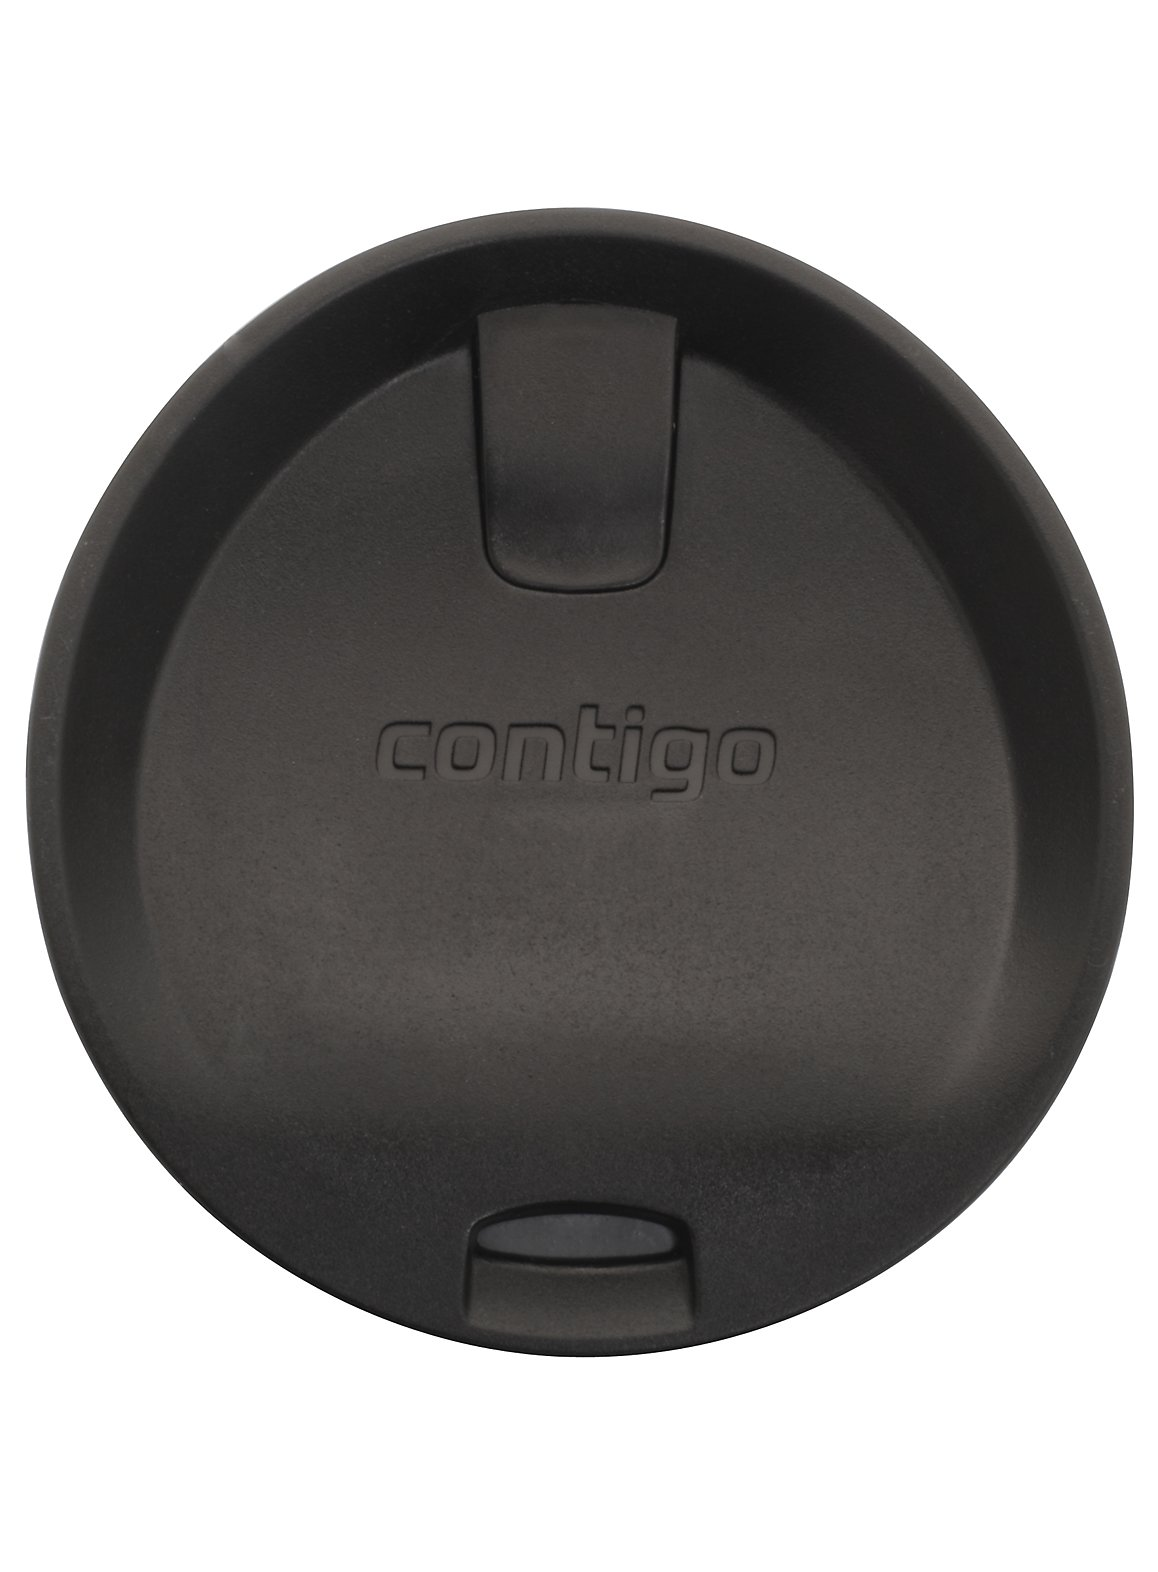 Contigo AUTOSEAL West Loop Stainless Steel Travel Mug, 20 oz, Stainless Steel by Contigo (Image #4)